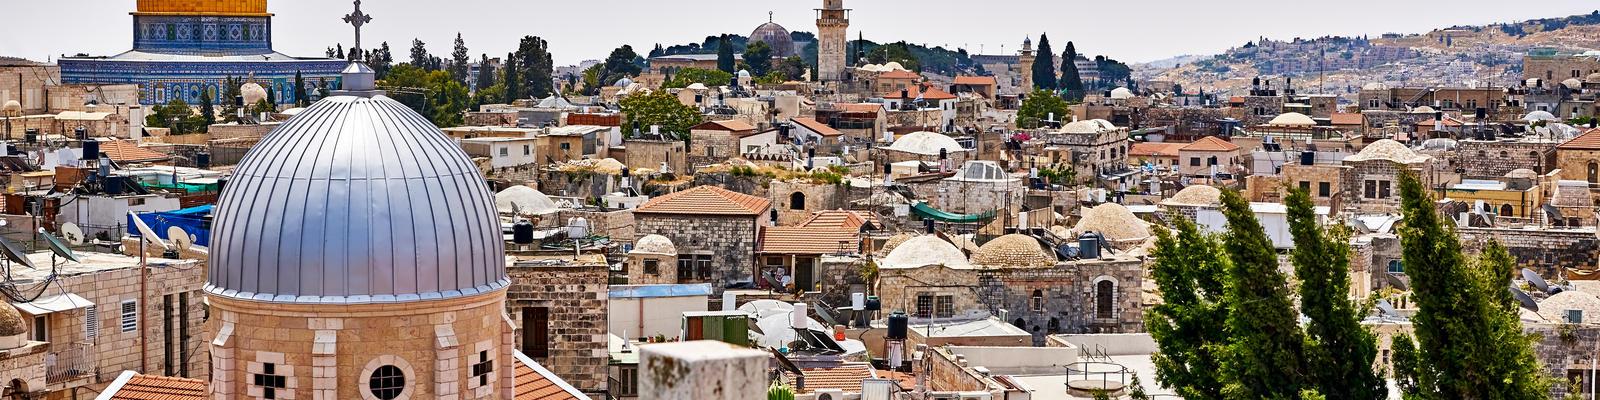 Jerusalem Panoramic Roof View (Photo: Kyrylo Glivin/Shutterstock)